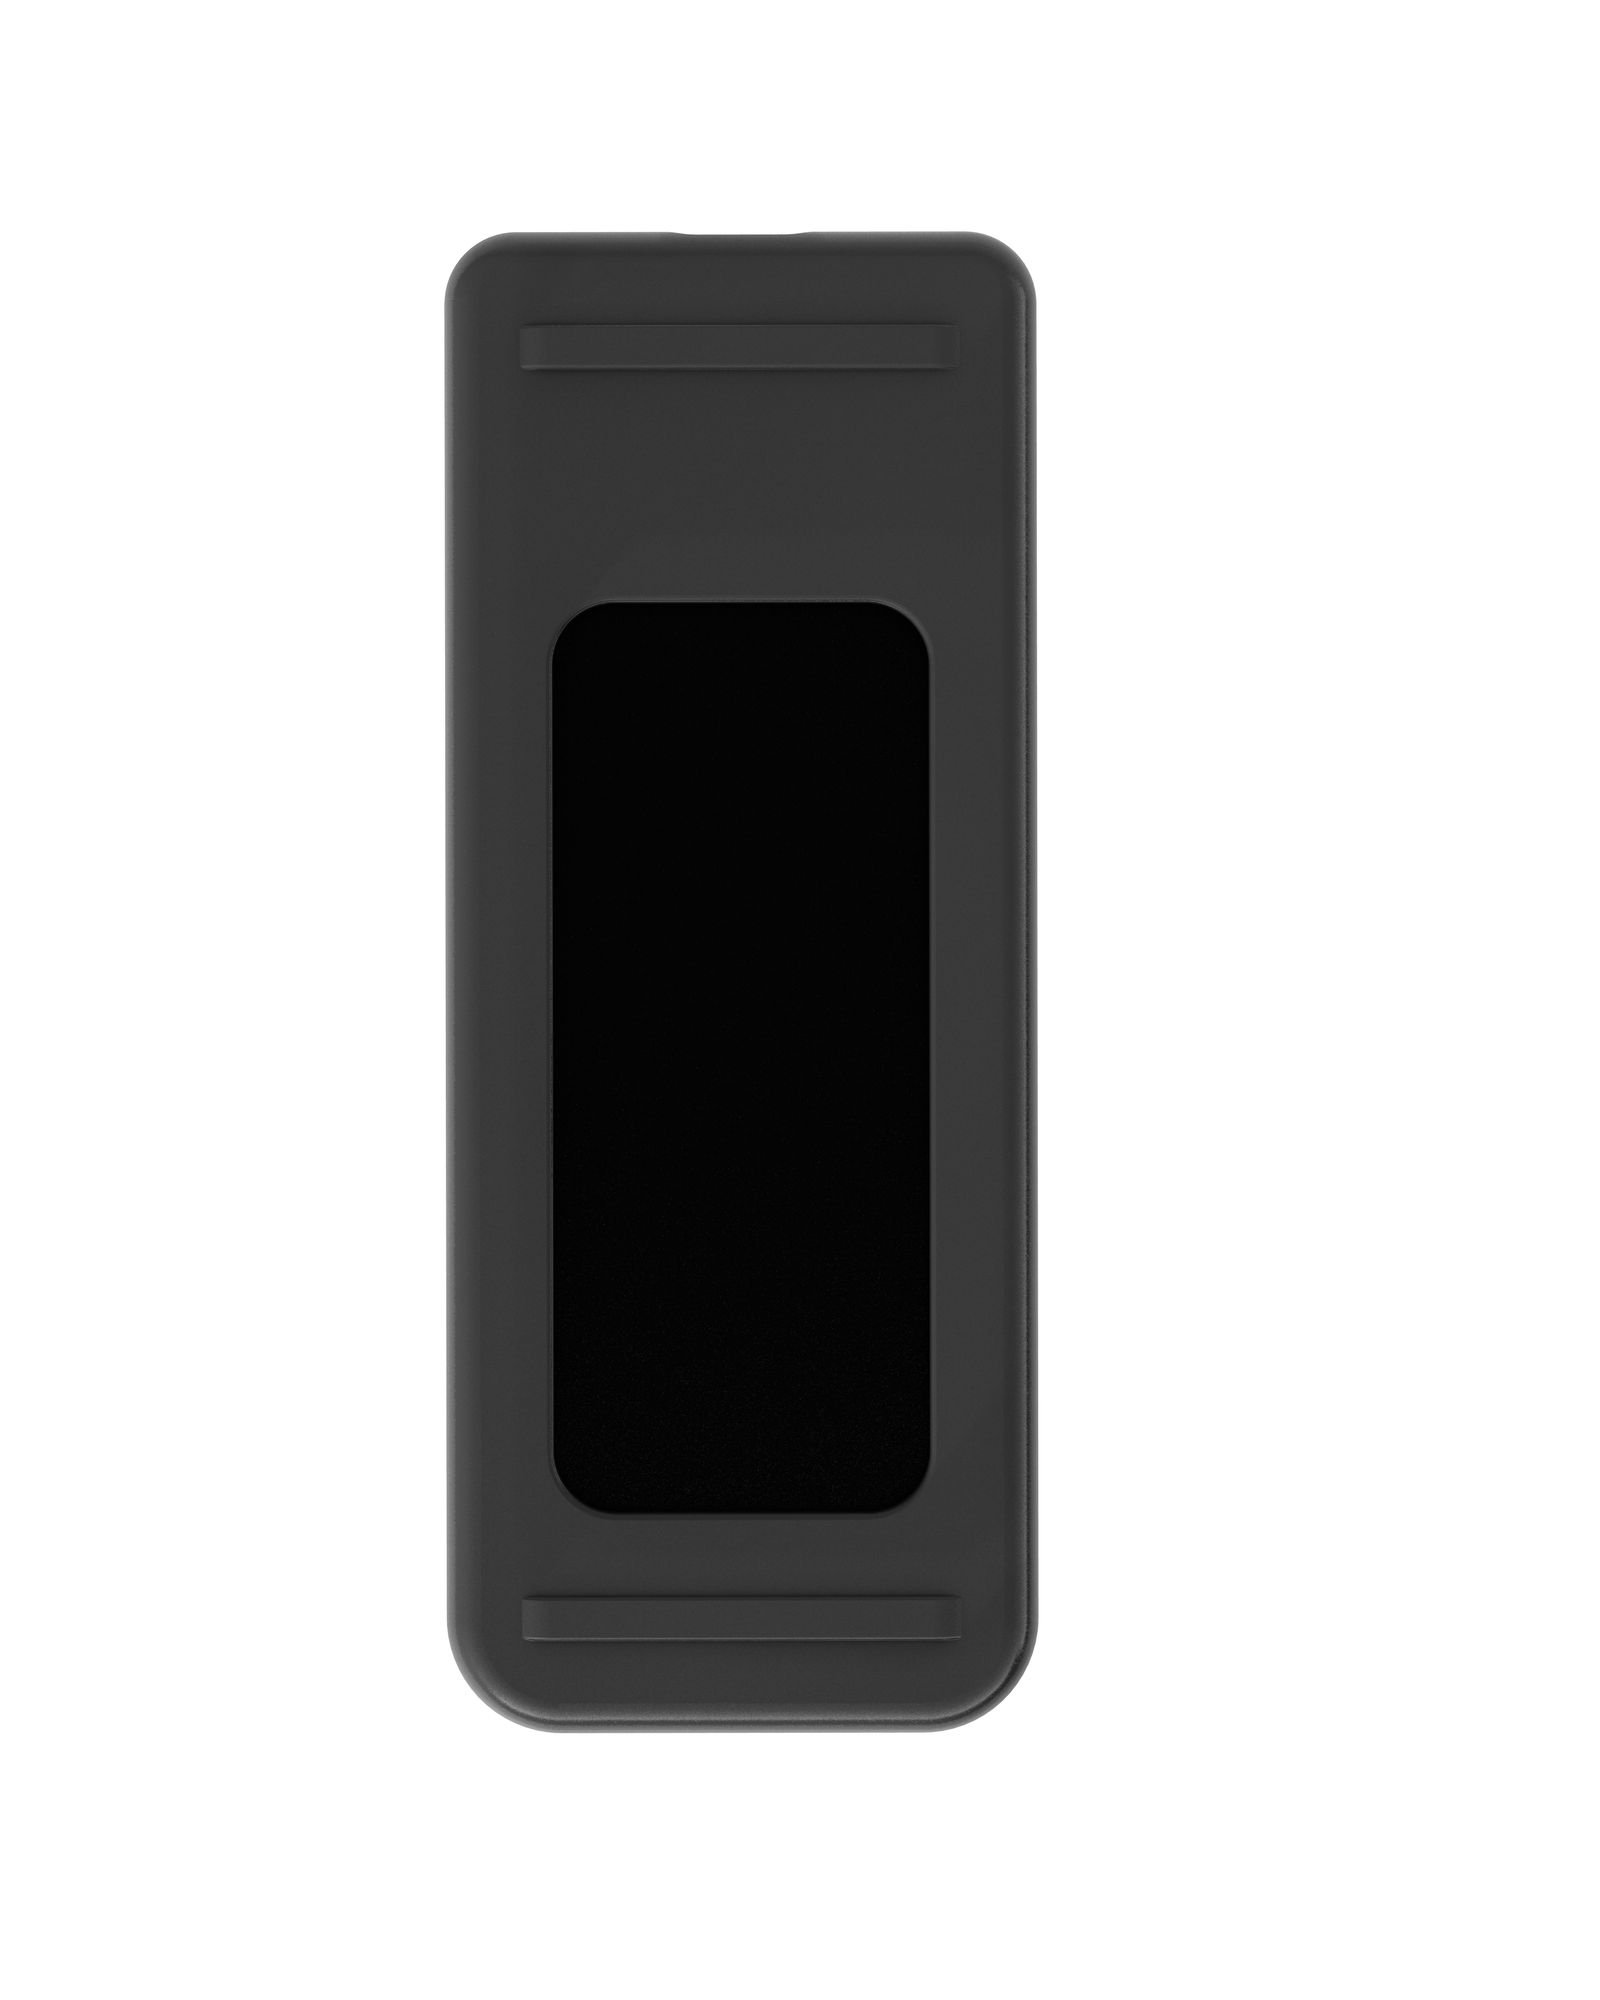 Glyph Atom SSD 2TB Black (External USB-C, USB 3.0, Thunderbolt 3) A2000BLK by Glyph Production Technologies (Image #2)